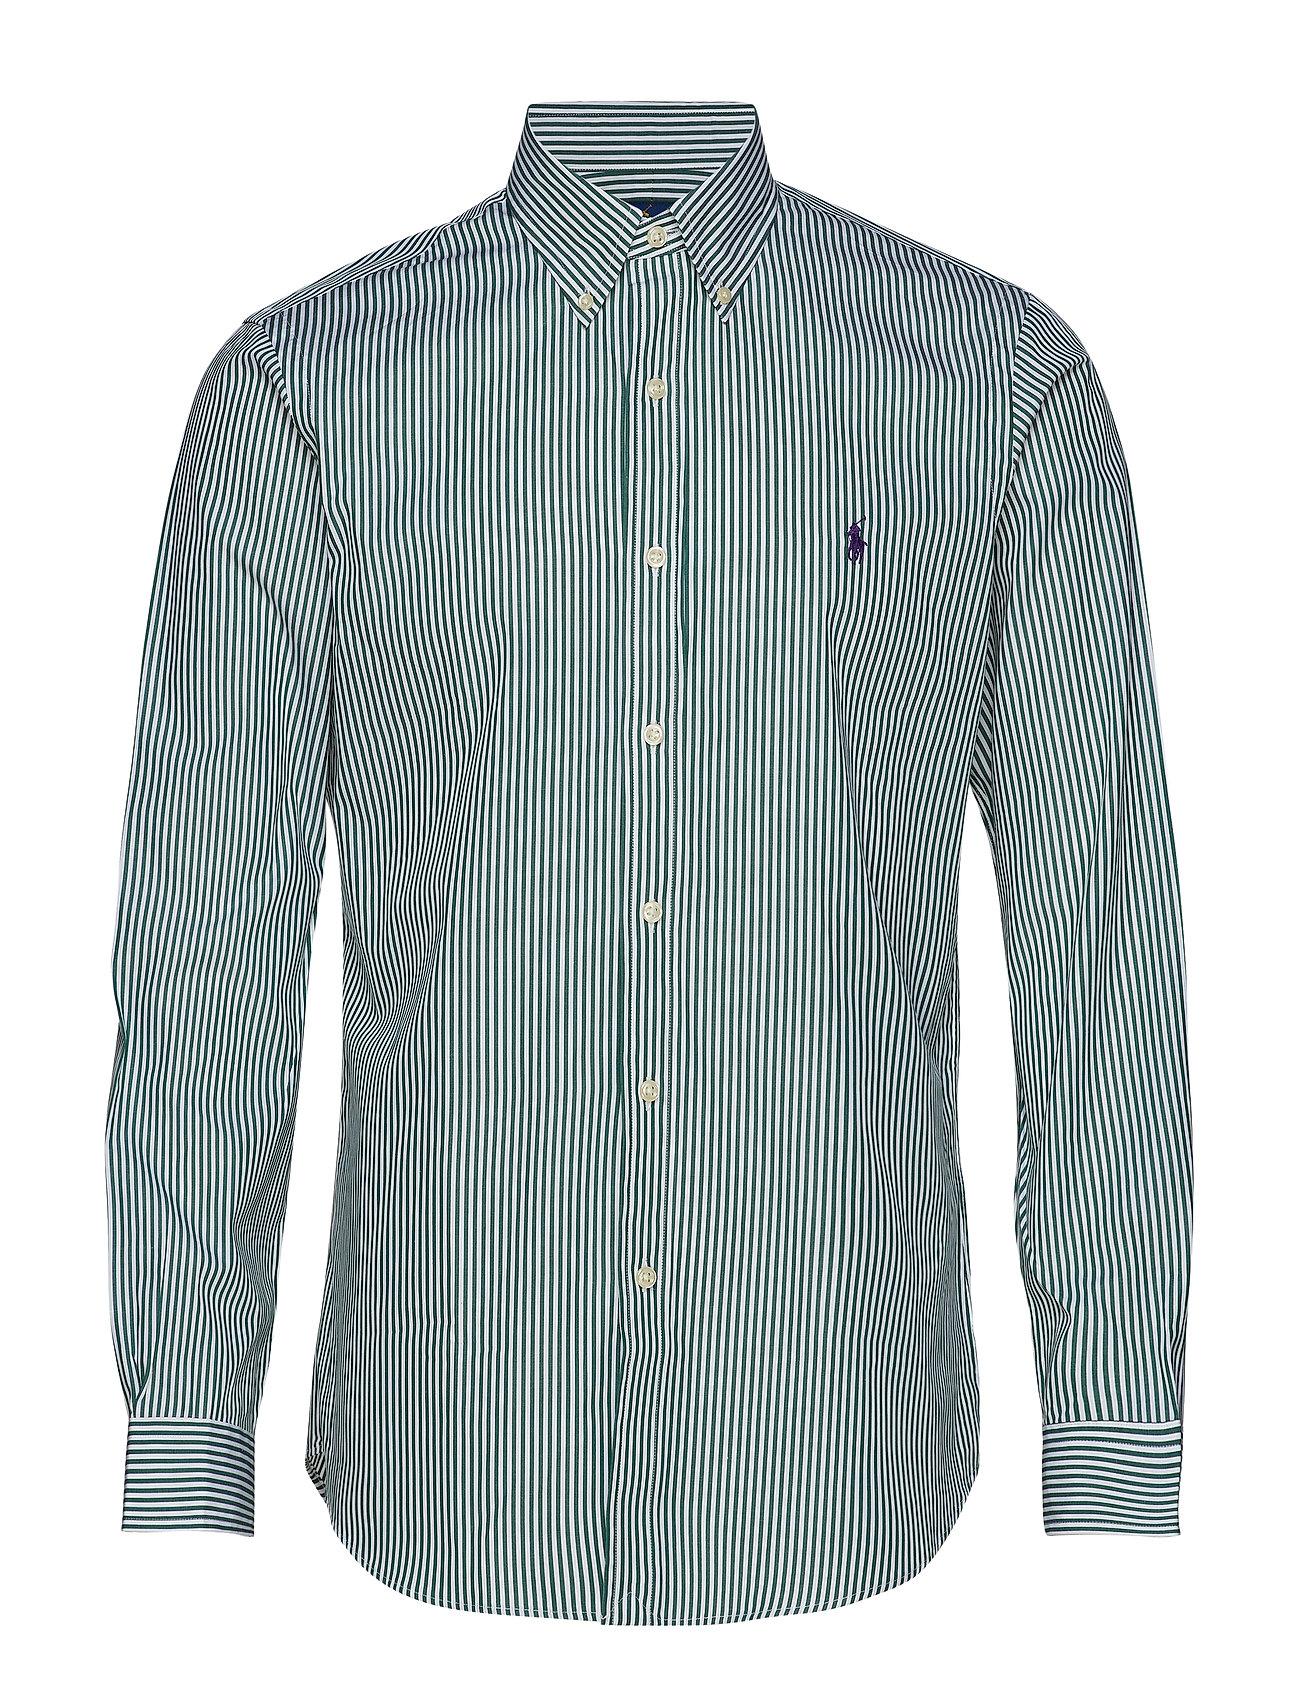 Polo Ralph Lauren Custom Fit Plaid Stretch Shirt - 4034B GREEN/STRIP